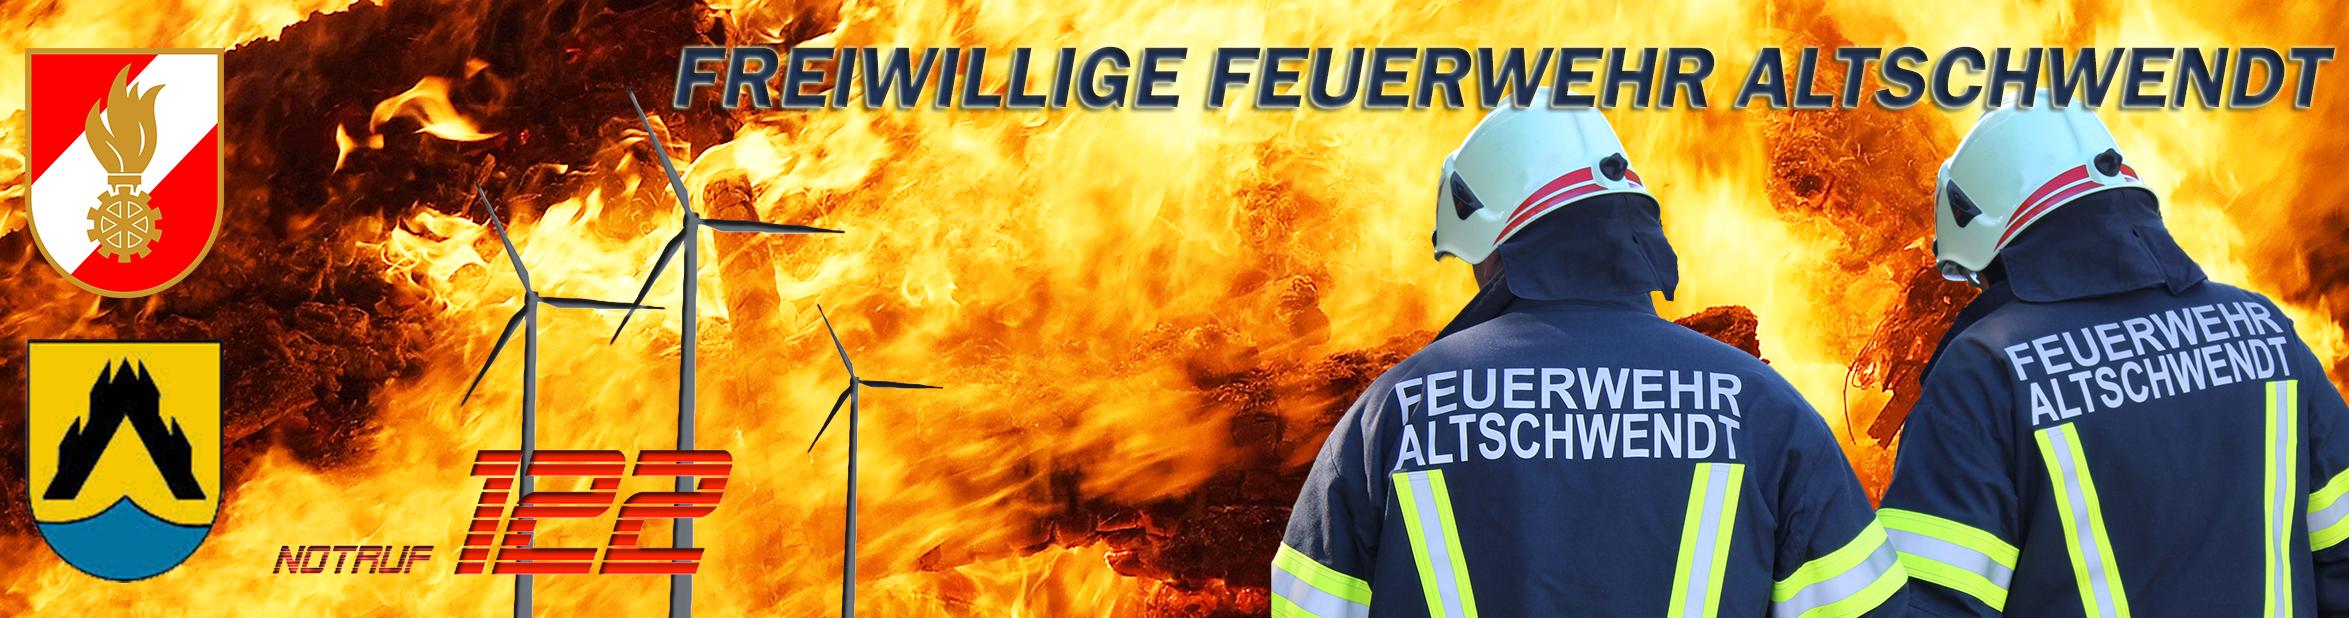 FF Altschwendt